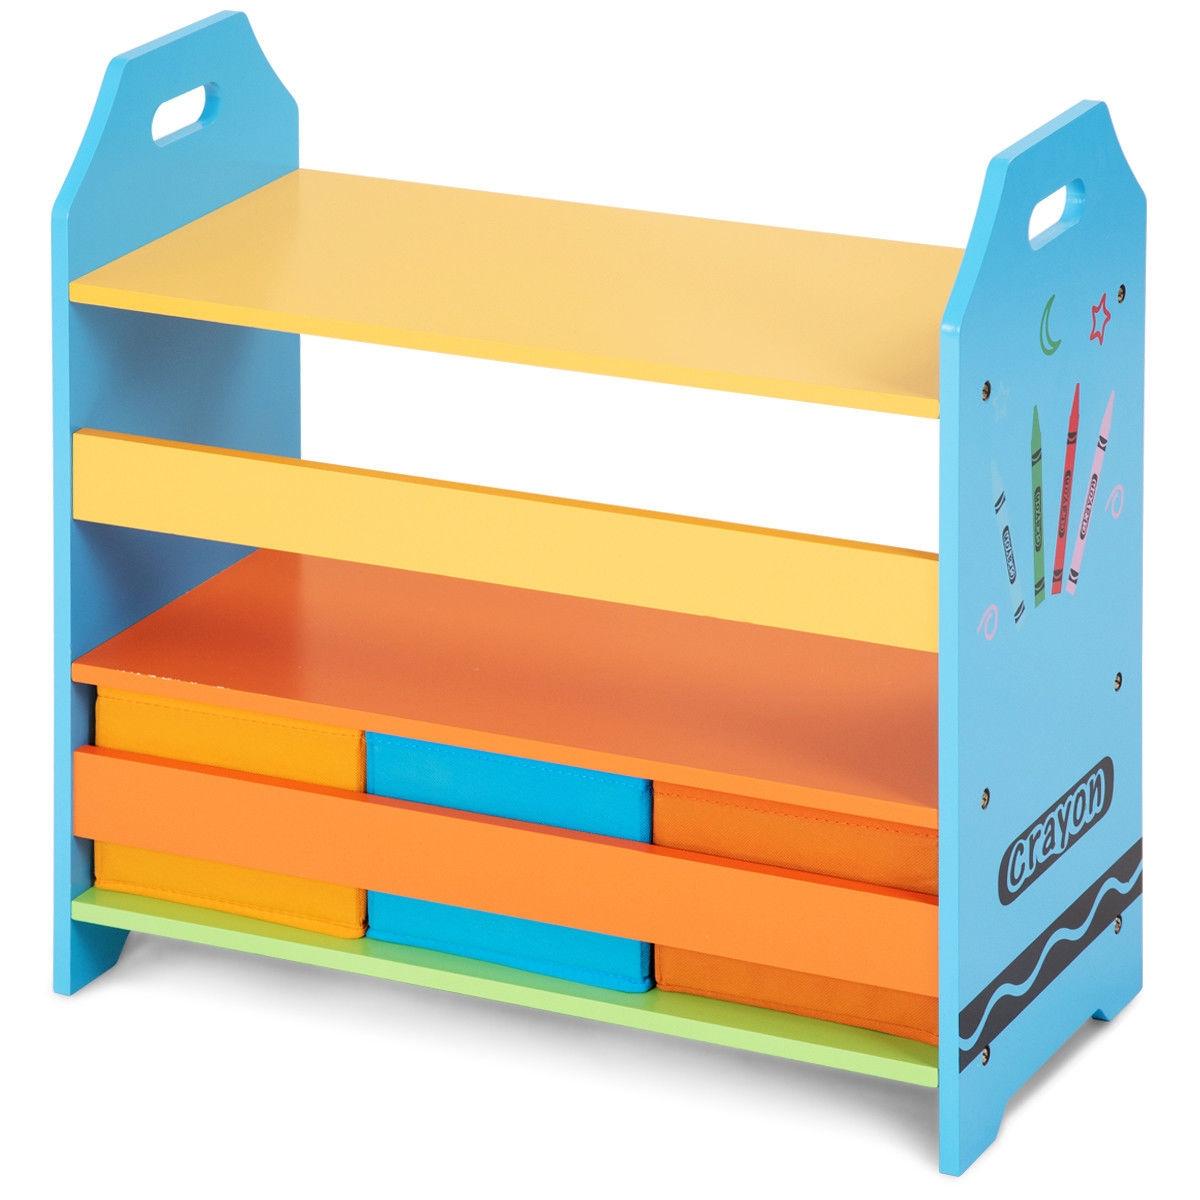 2 Tiers Crayon Themed Bookshelf With 3 Storage Bins